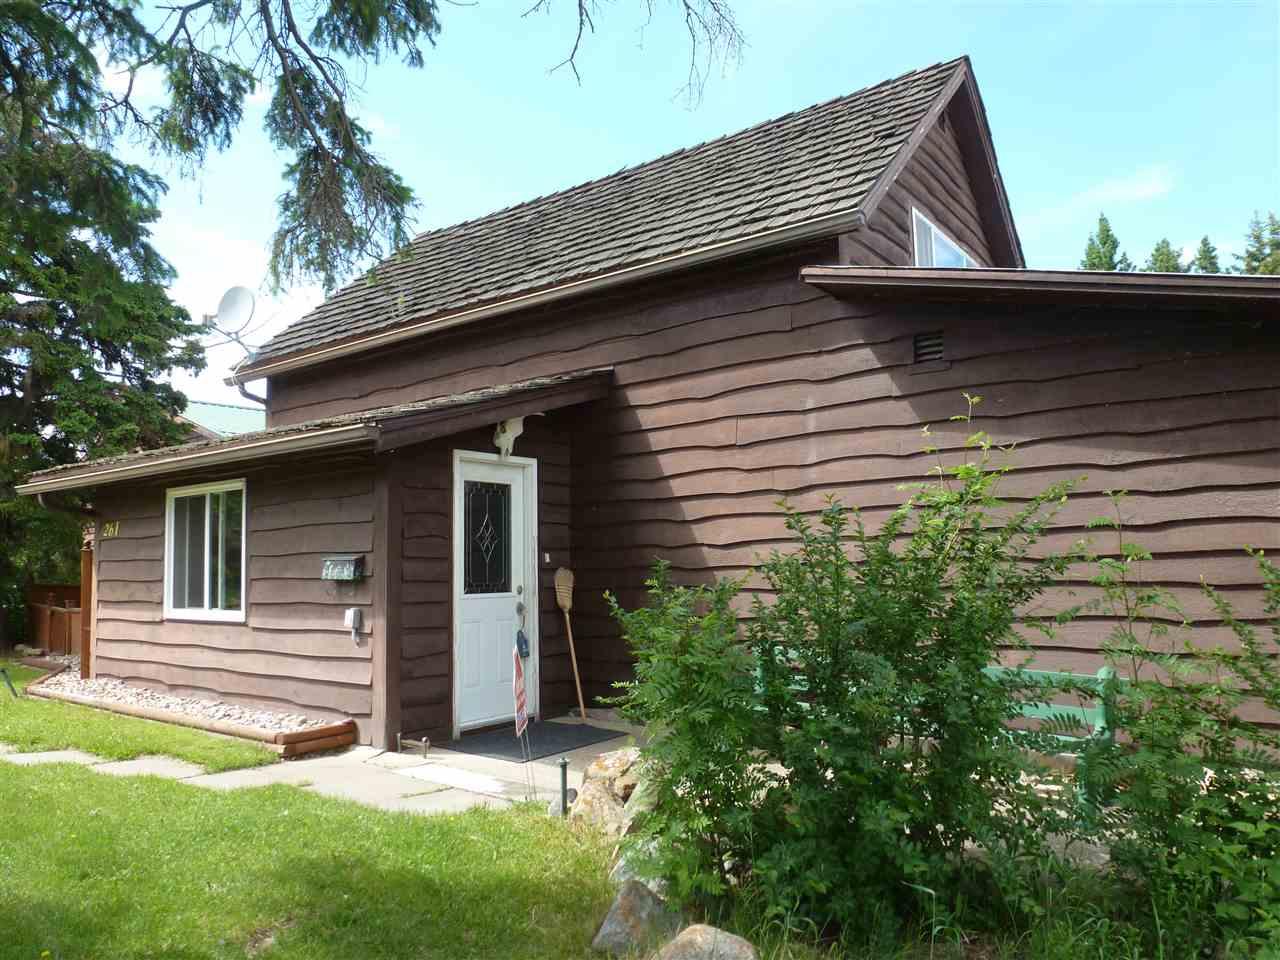 261 22106 South Cooking Lake Road, Rural Strathcona County, MLS® # E4160991